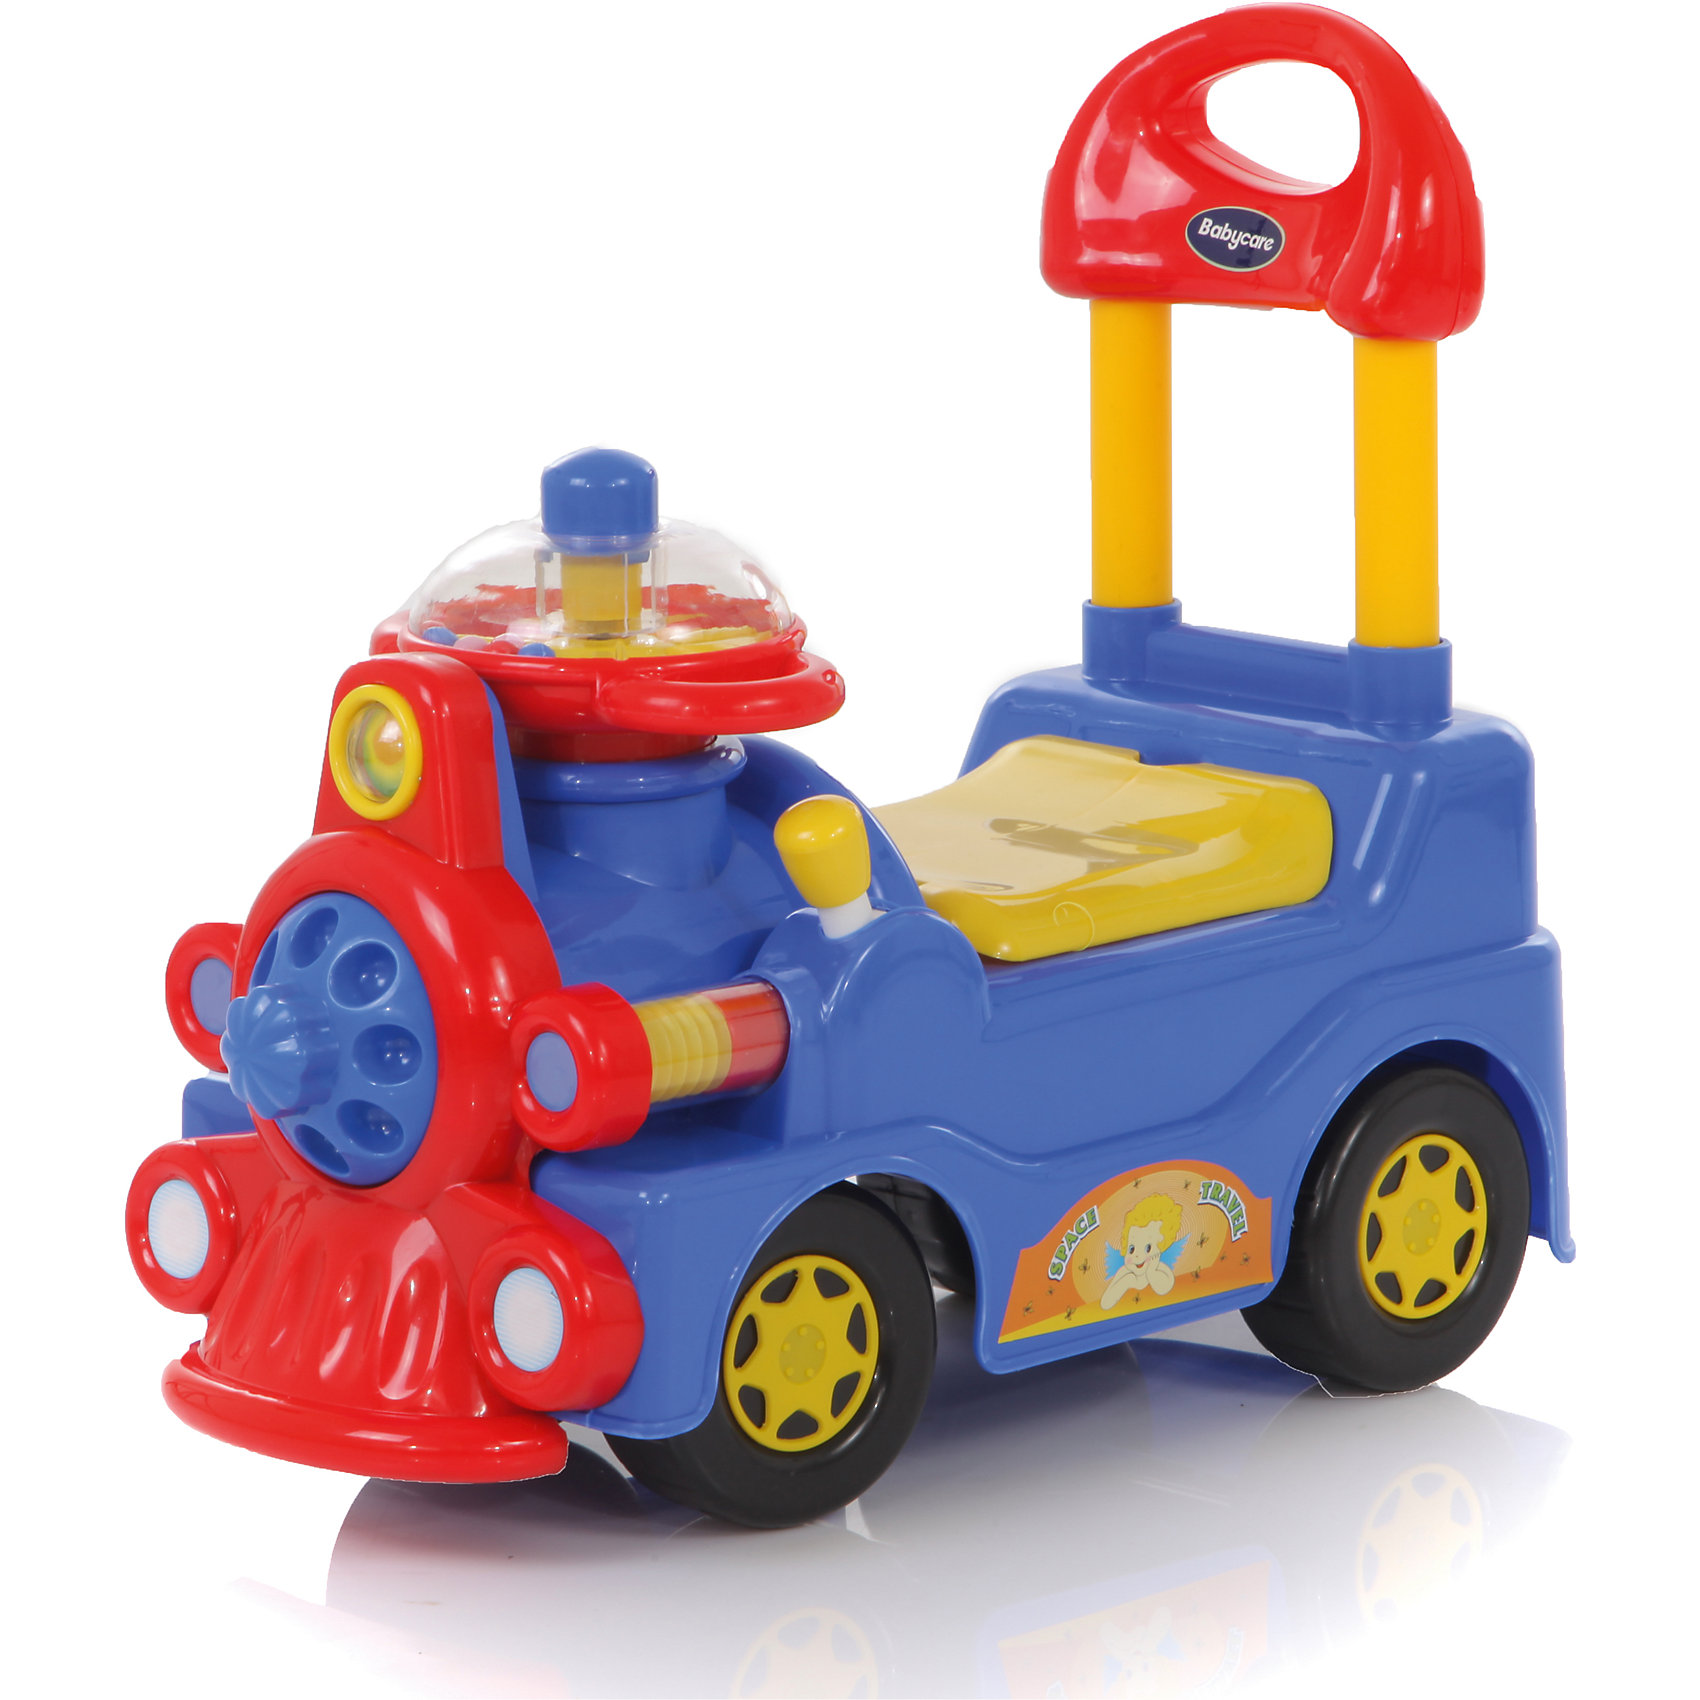 Каталка Train, синяя, Baby CareИгрушки для малышей<br><br><br>Ширина мм: 570<br>Глубина мм: 270<br>Высота мм: 510<br>Вес г: 3000<br>Возраст от месяцев: 12<br>Возраст до месяцев: 48<br>Пол: Унисекс<br>Возраст: Детский<br>SKU: 5614432